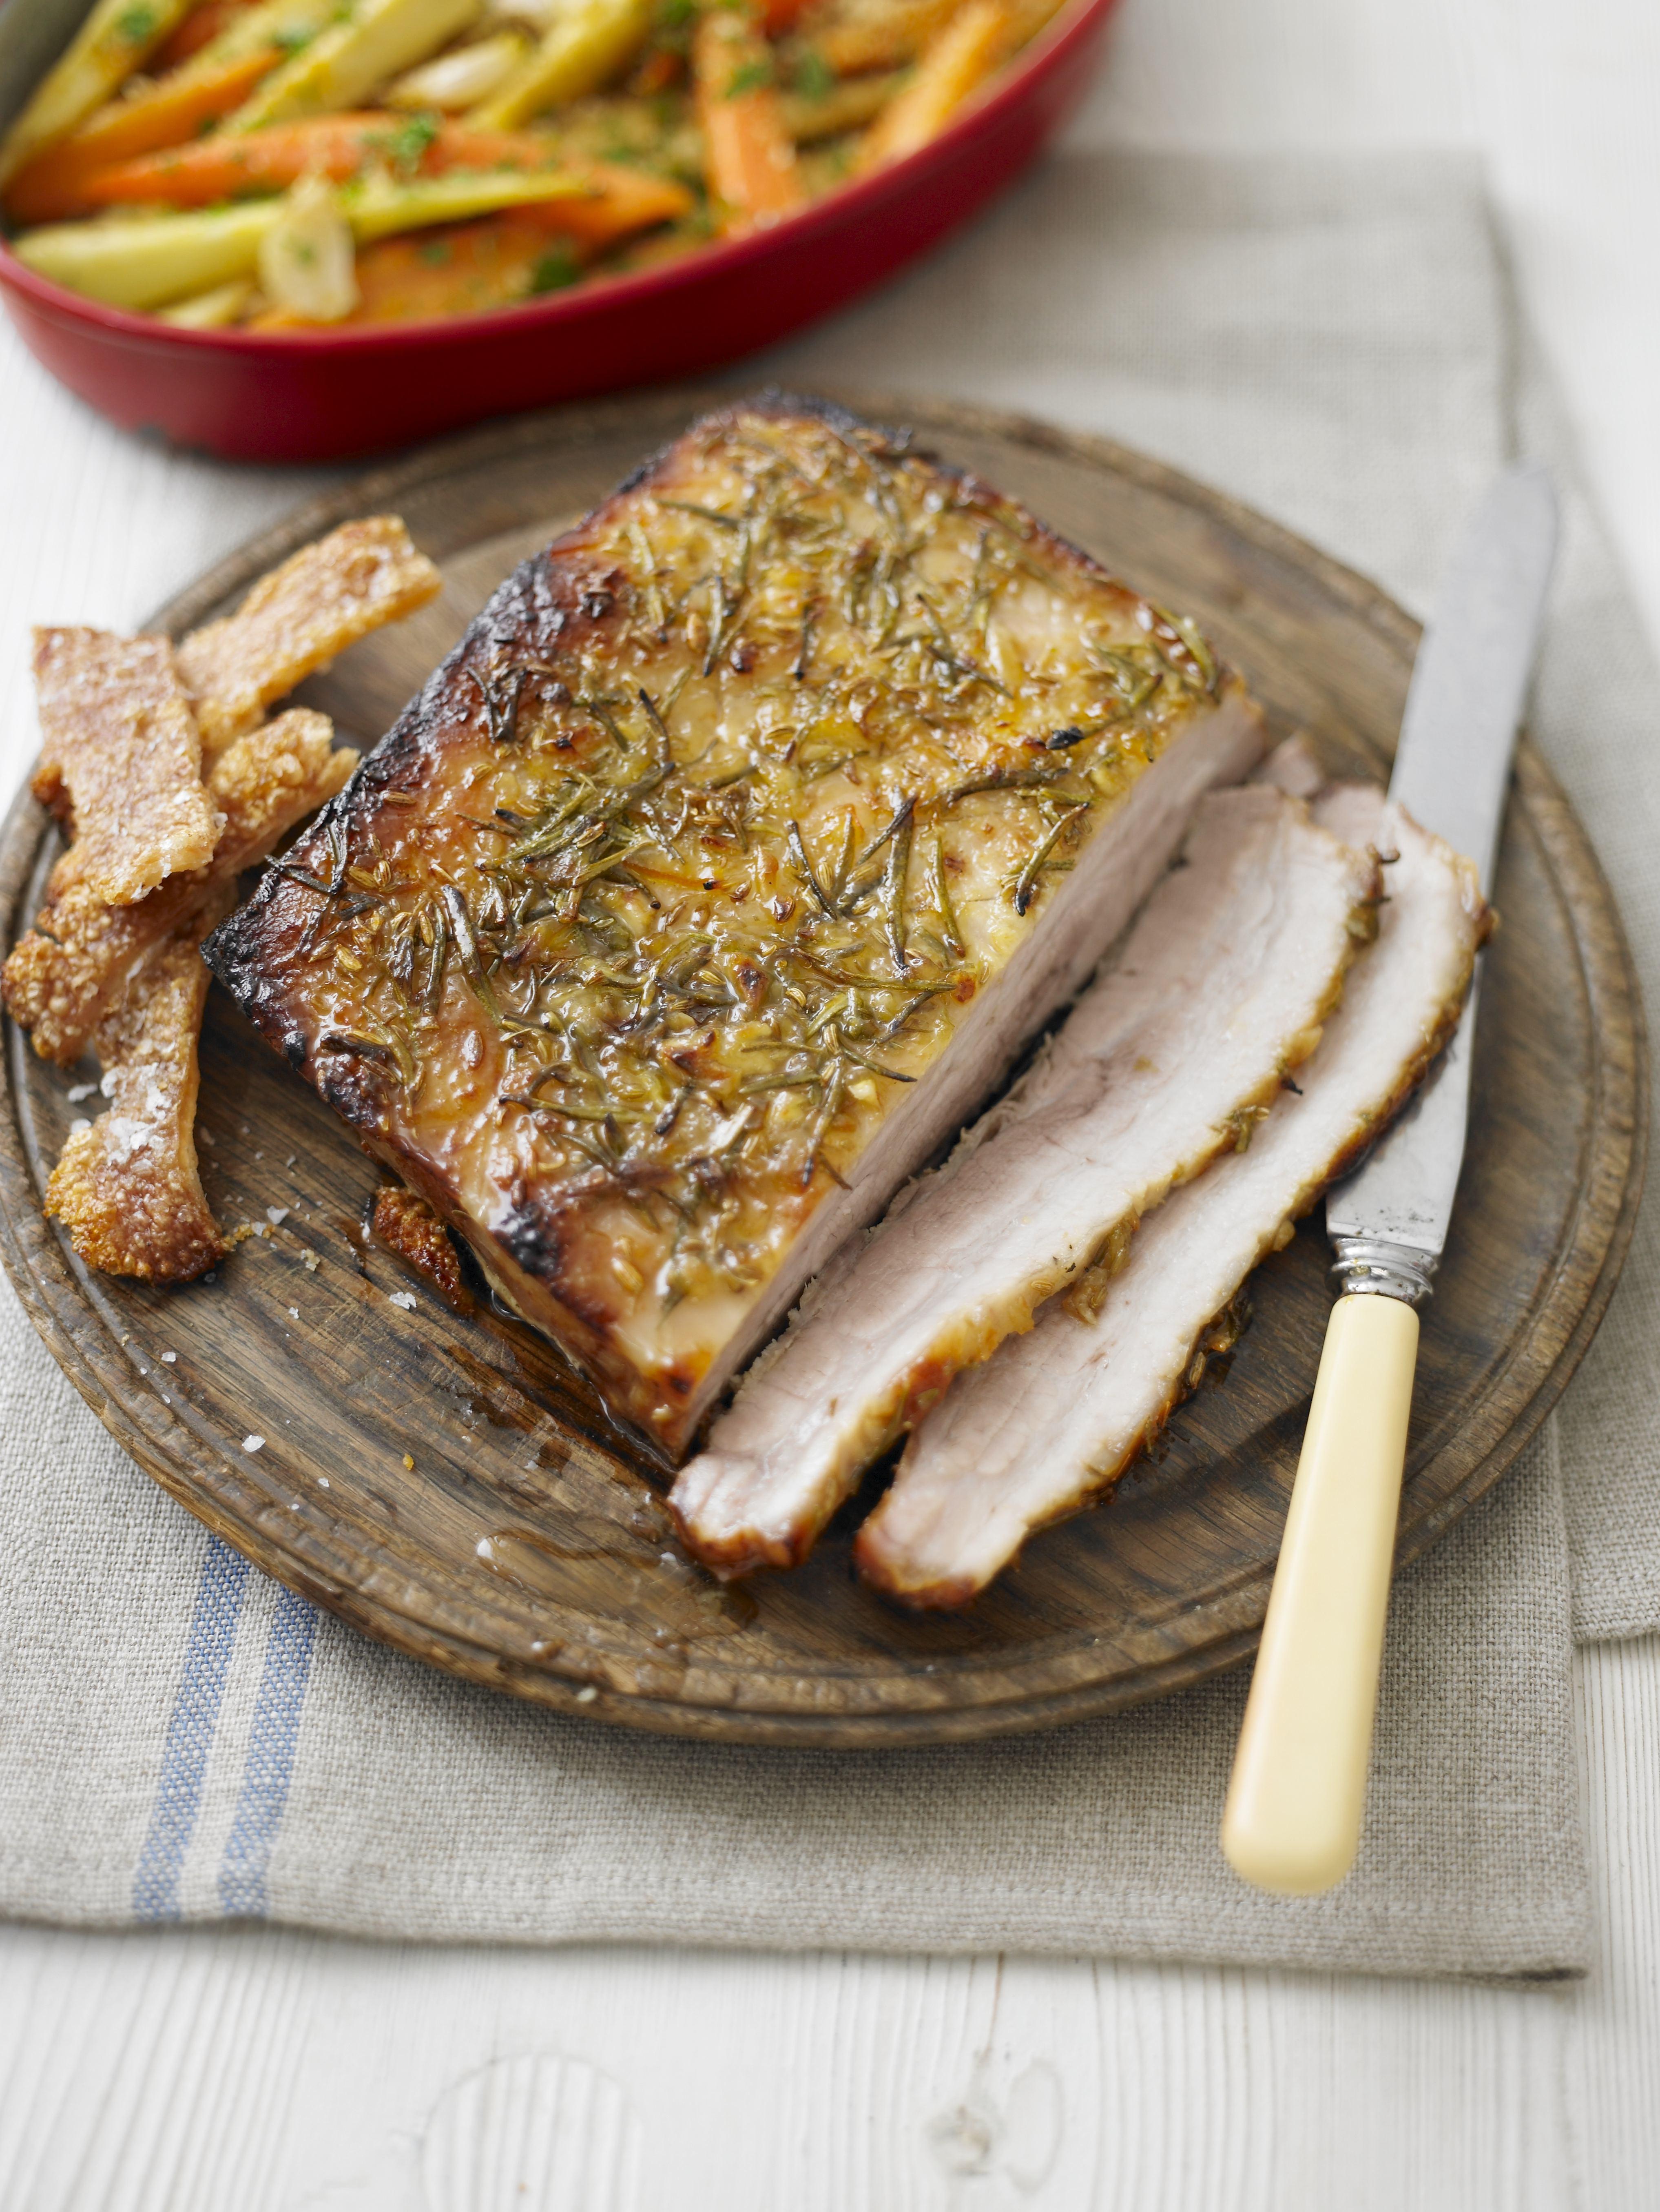 146 Slow Roast Belly of Pork HR